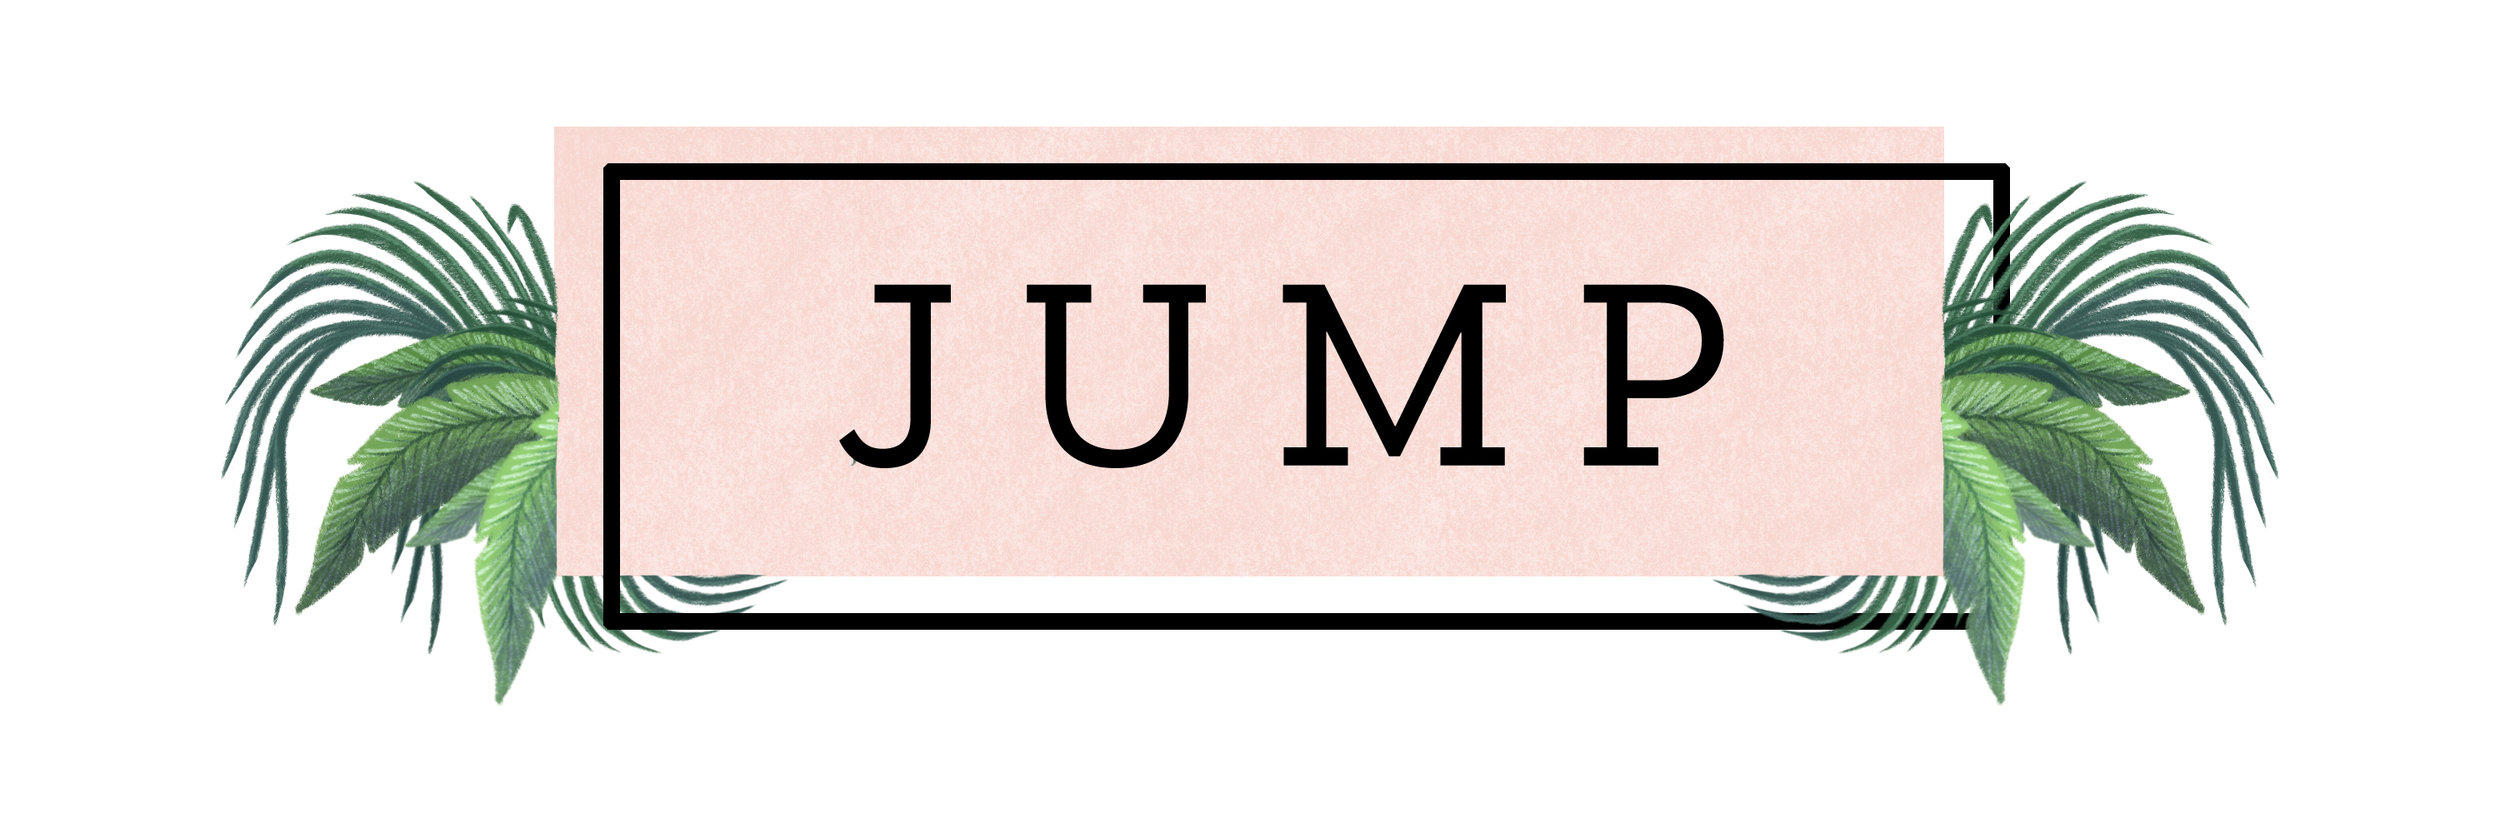 Jump Header.jpg